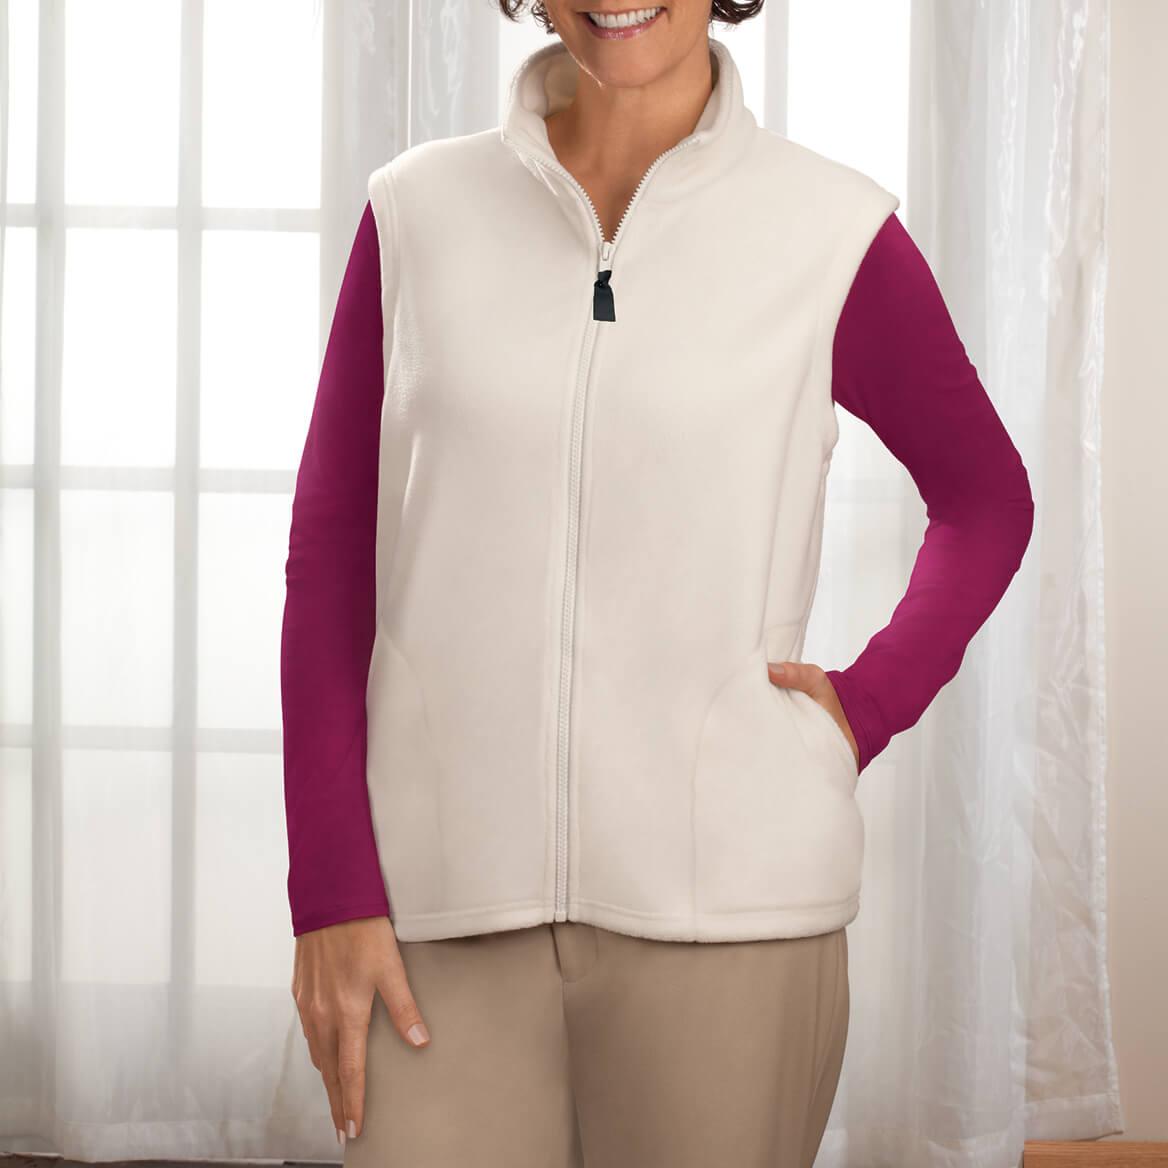 Micro Fleece Vest By Sawyer Creek Studio™-325818